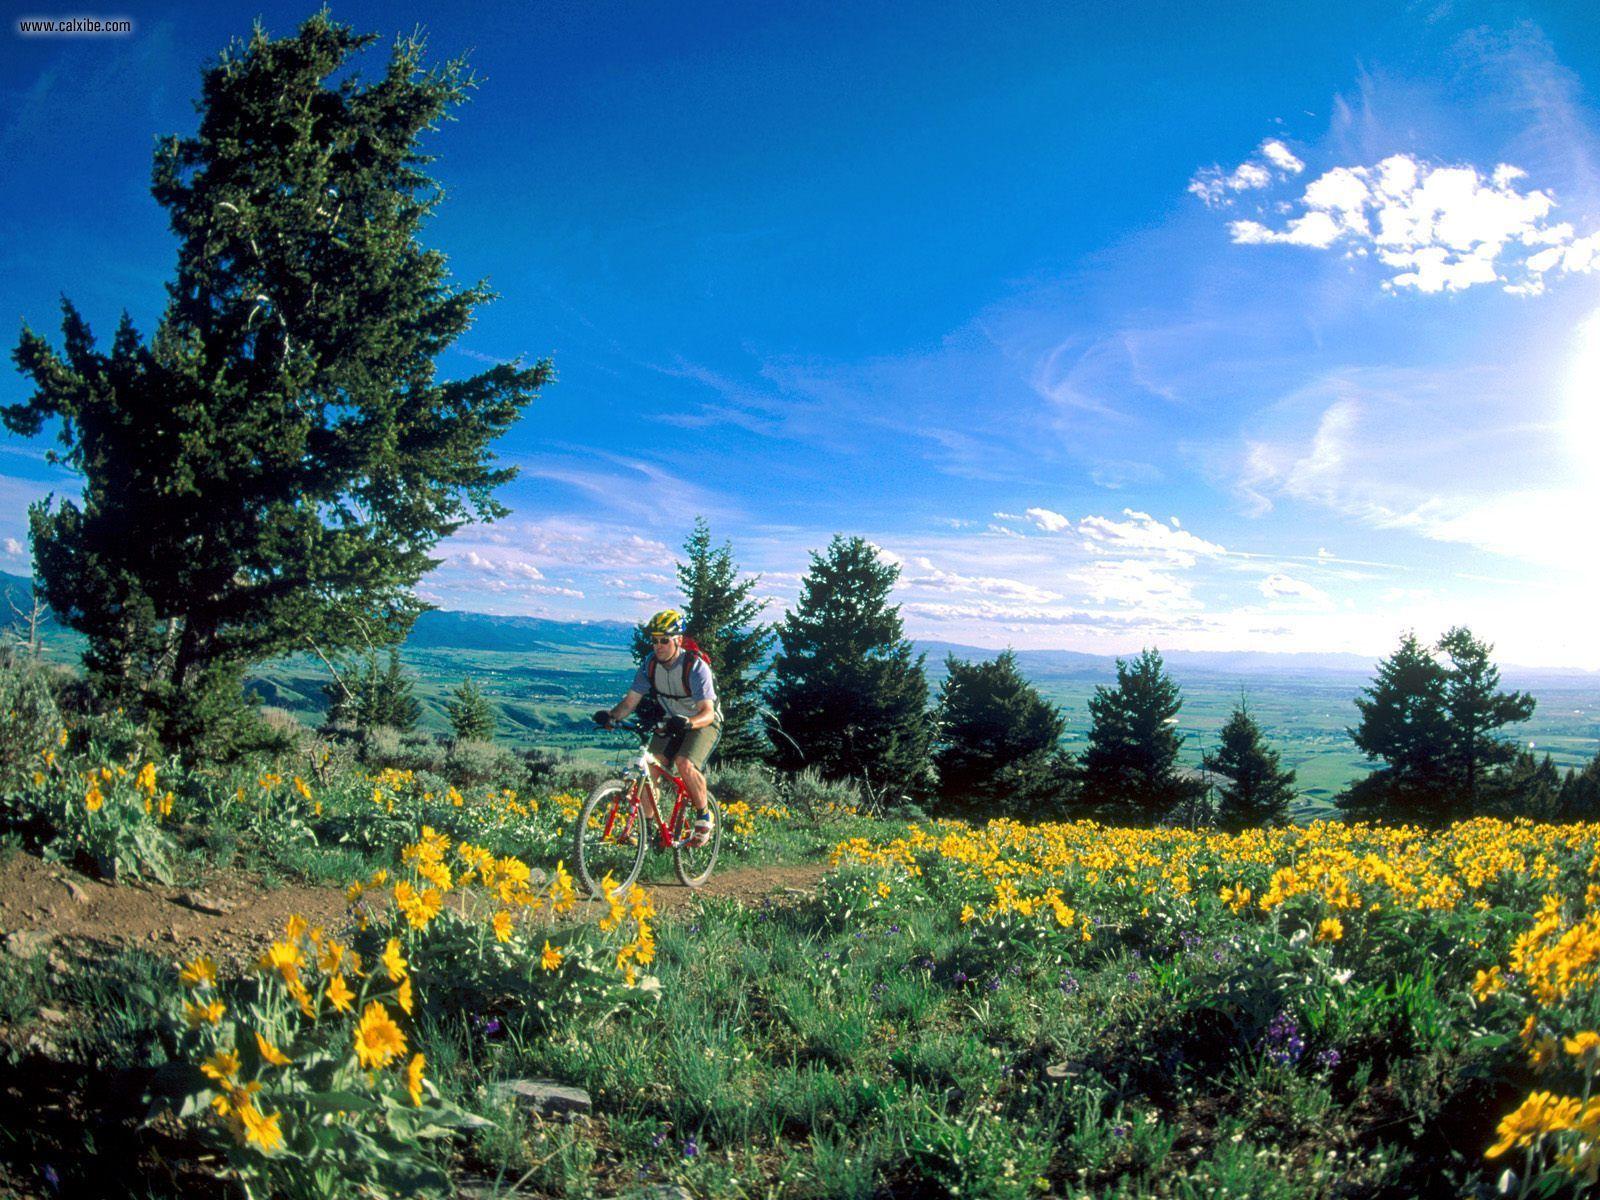 Climbing_through_Flowers_Bozeman_Montana.jpg